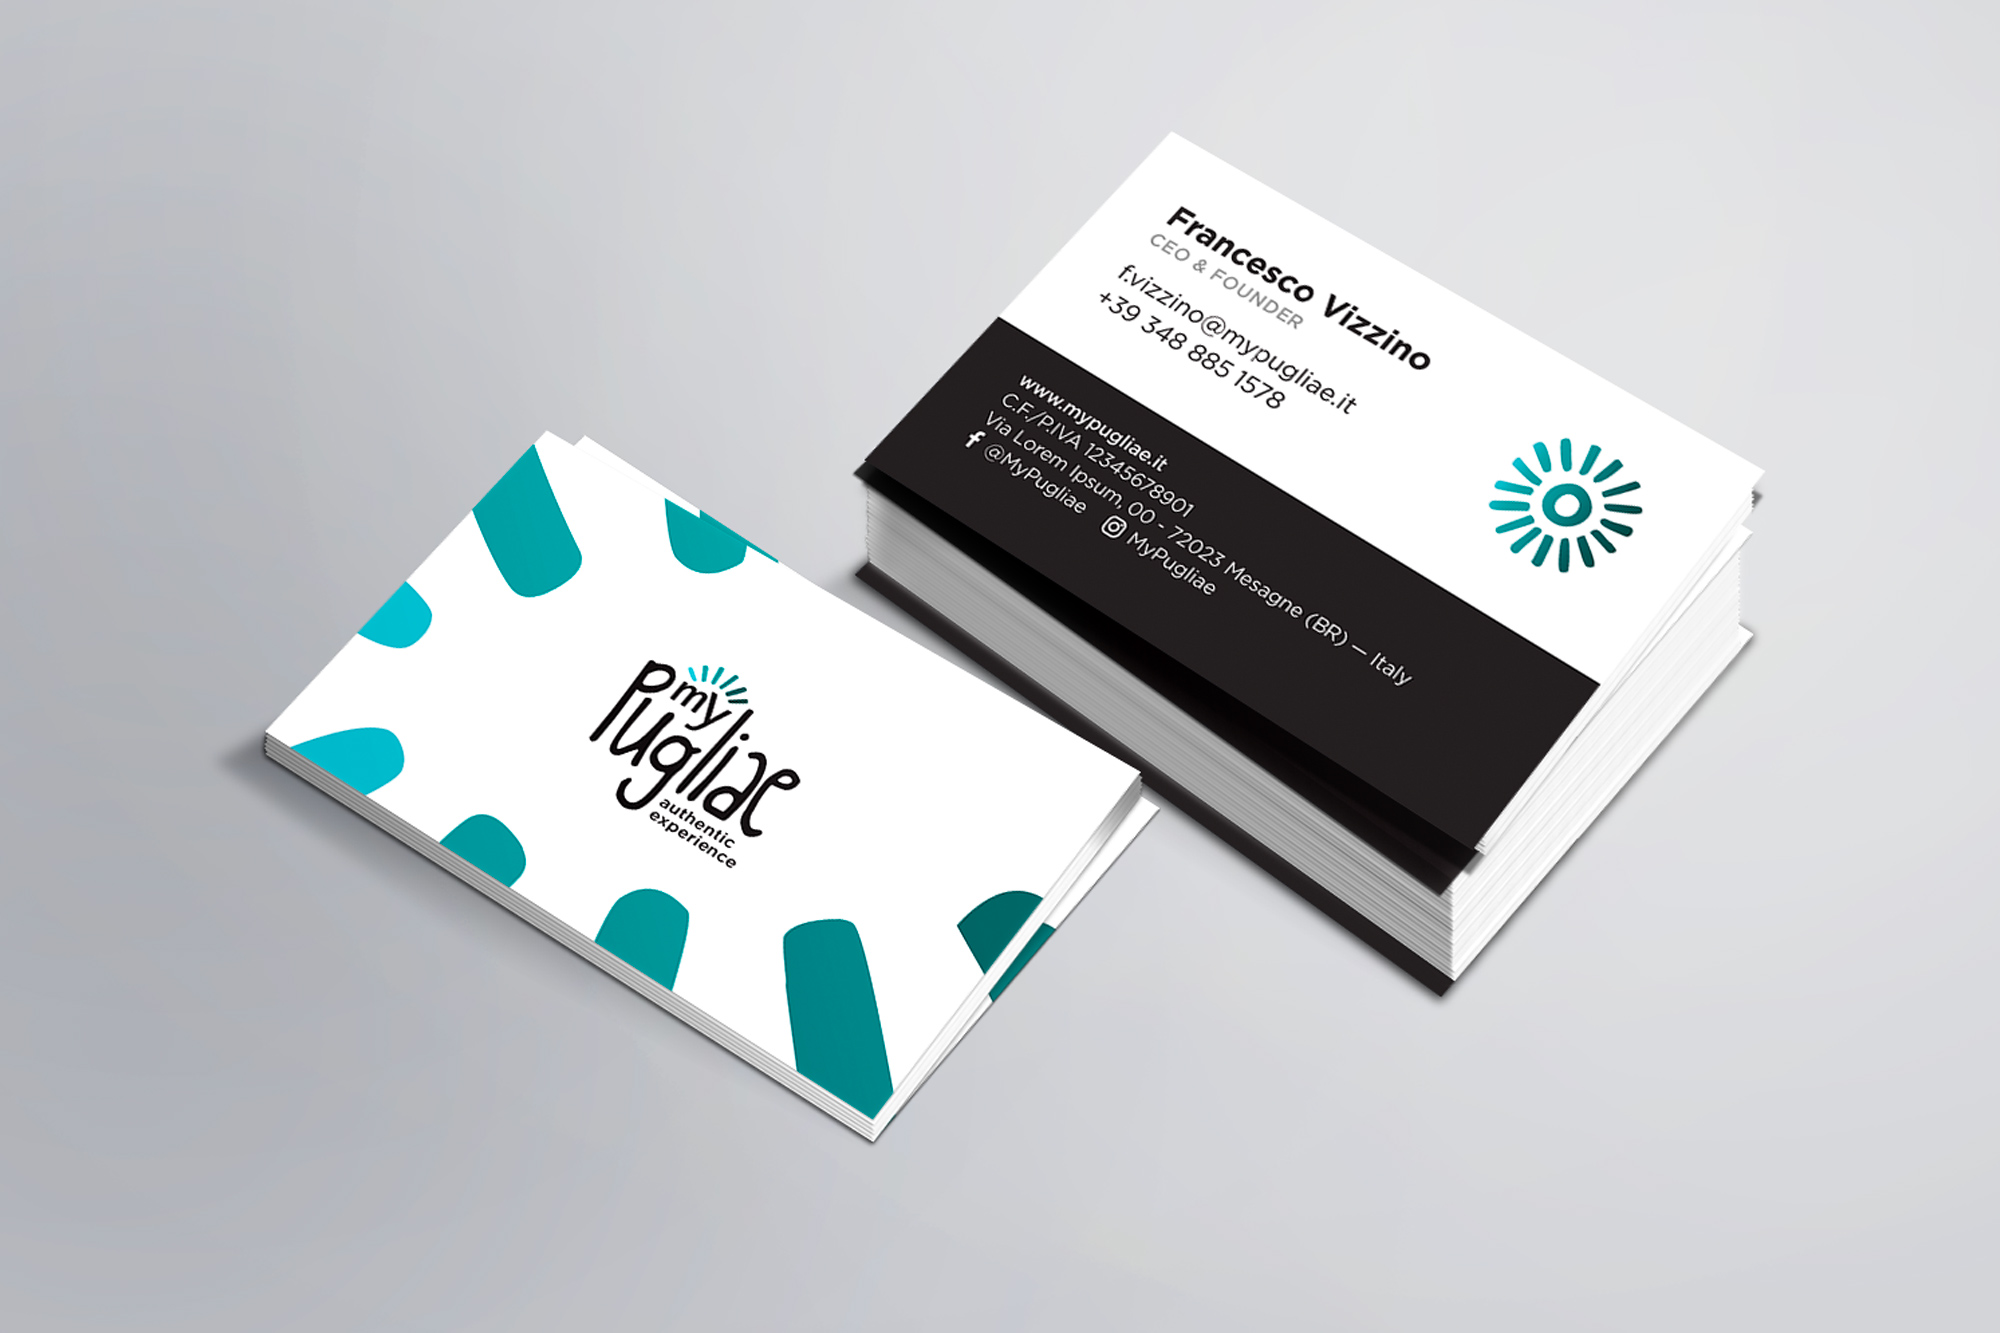 MyPugliae - logo/branding, digital, print - img 4